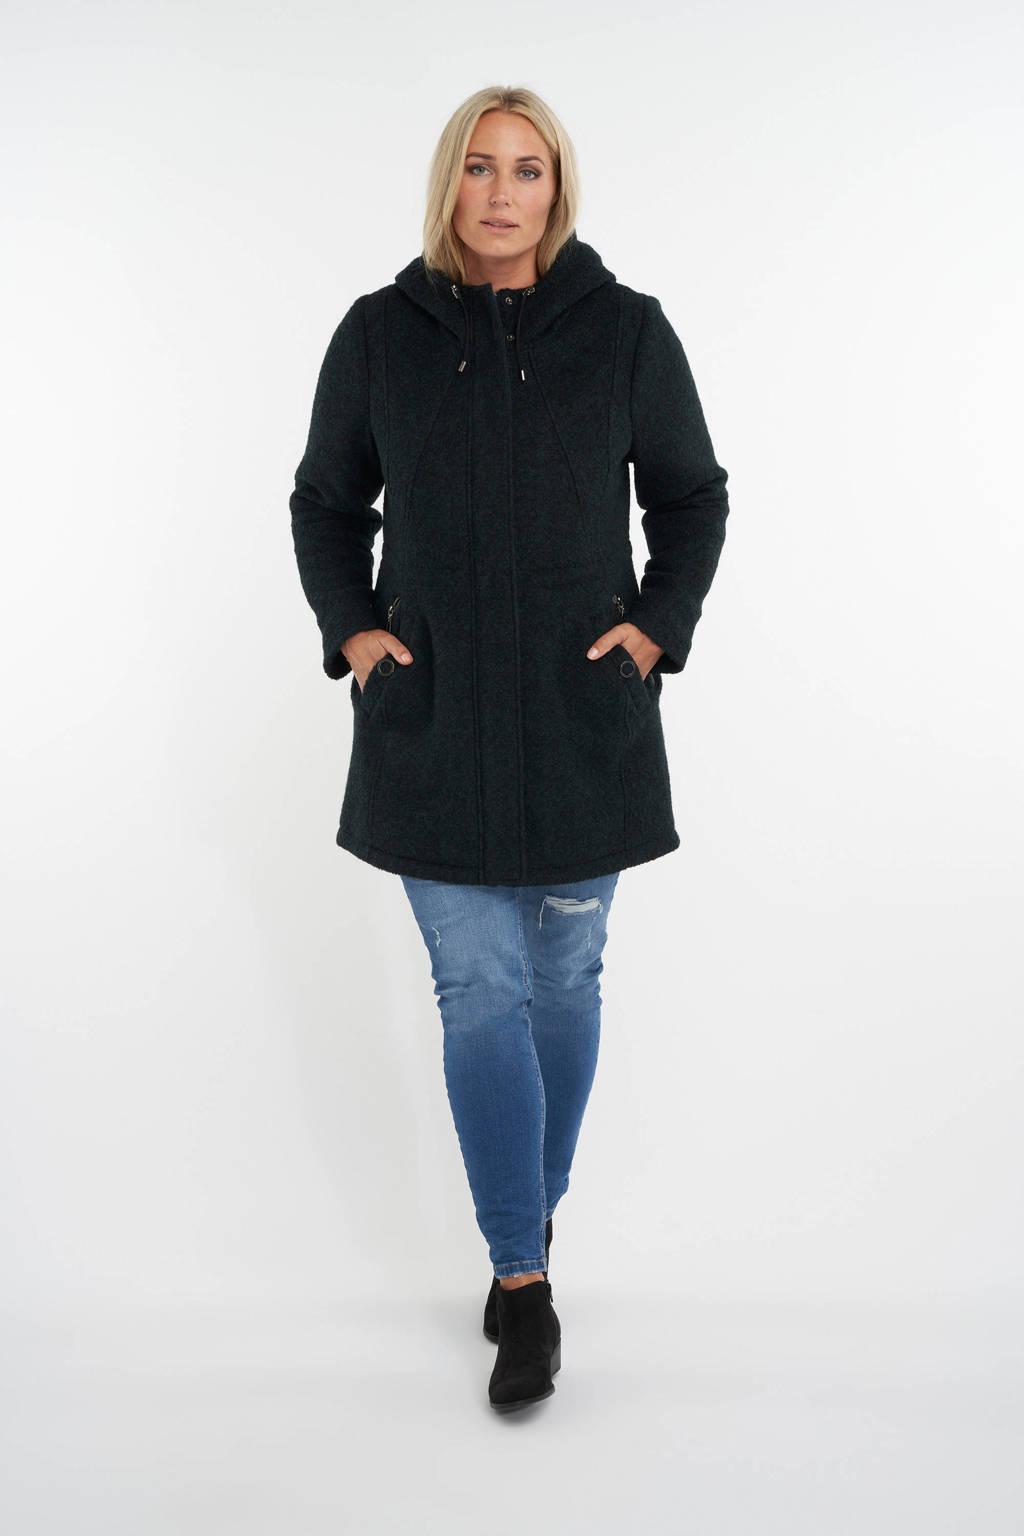 MS Mode gemêleerde jas zwart, Zwart